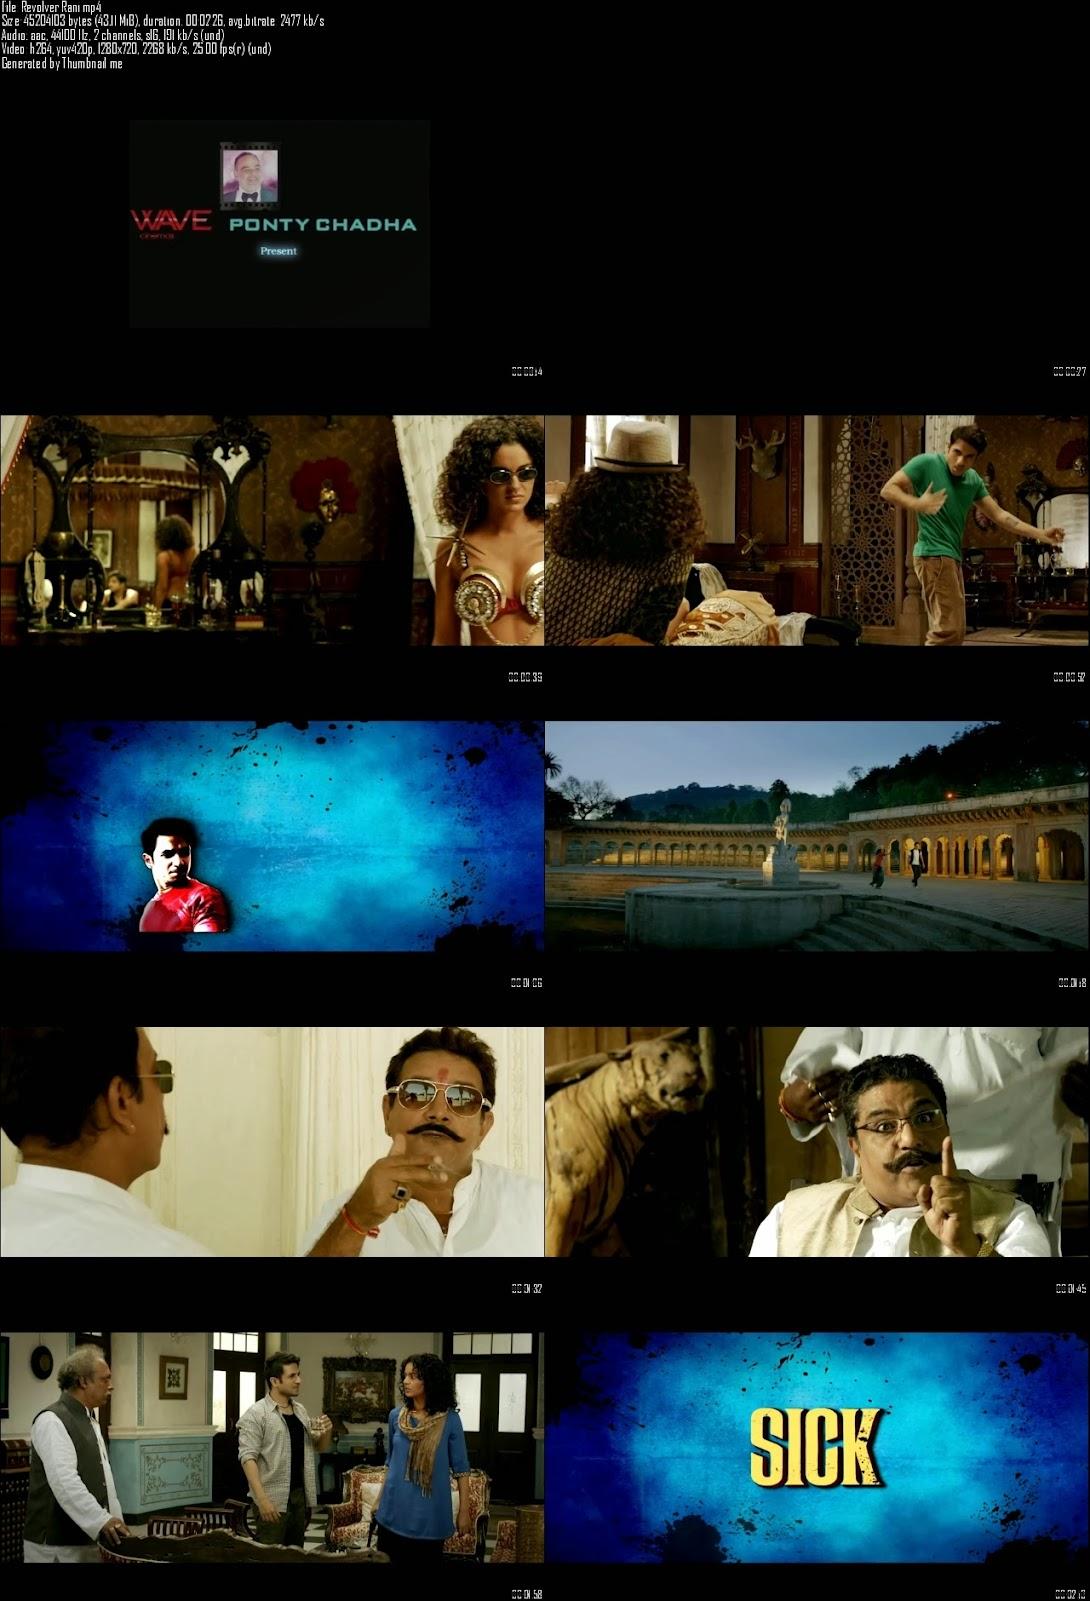 Revolver Rani (2014) Hindi Movie Official Trailer | world4free, Revolver Rani (2014) Movie Official Trailer, Revolver Rani (2014) Movie Official Trailer , free Revolver Rani (2014) Movie Official Trailer , full movie Revolver Rani (2014) Movie Official Trailer , download Revolver Rani (2014) Movie Official Trailer, world4free.cc/world4free/world4freeu/worldfree/worldfree4u/World4free, Revolver Rani (2014) Movie Official Trailer.